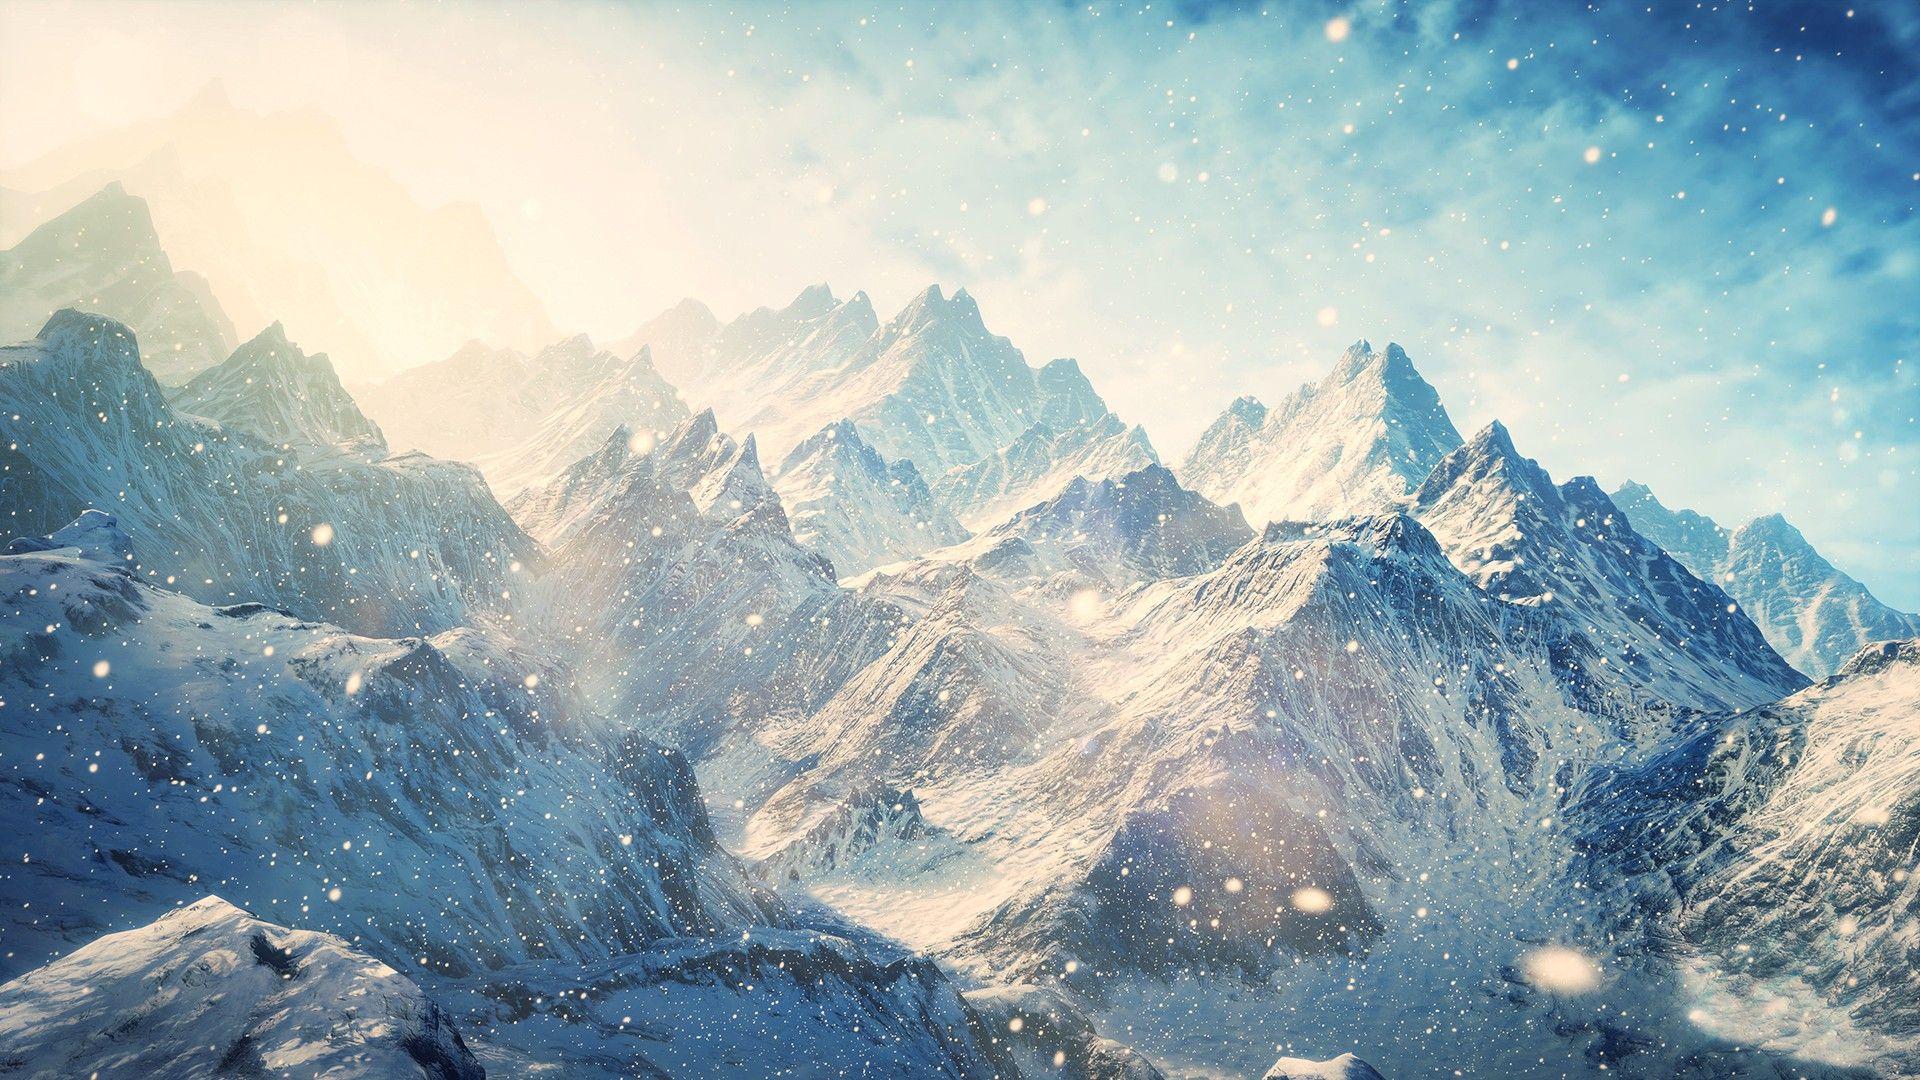 Good Wallpaper Mountain Hipster - 90550b3799ae9d42f5389afc02fd7229  Photograph_201210.jpg